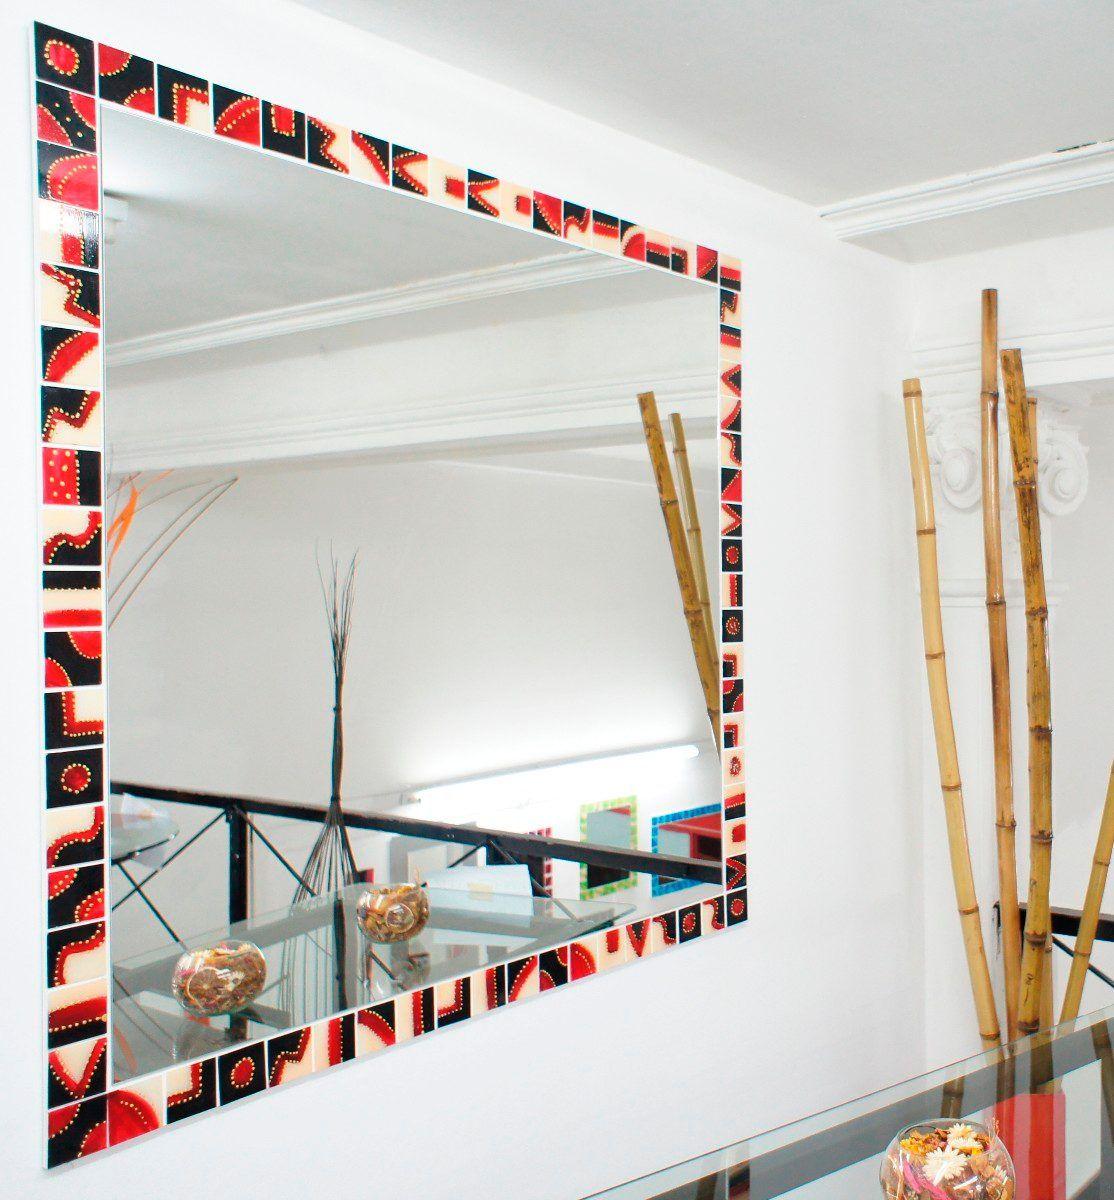 Espejos de decoracion bogota for Decoracion y hogar bogota